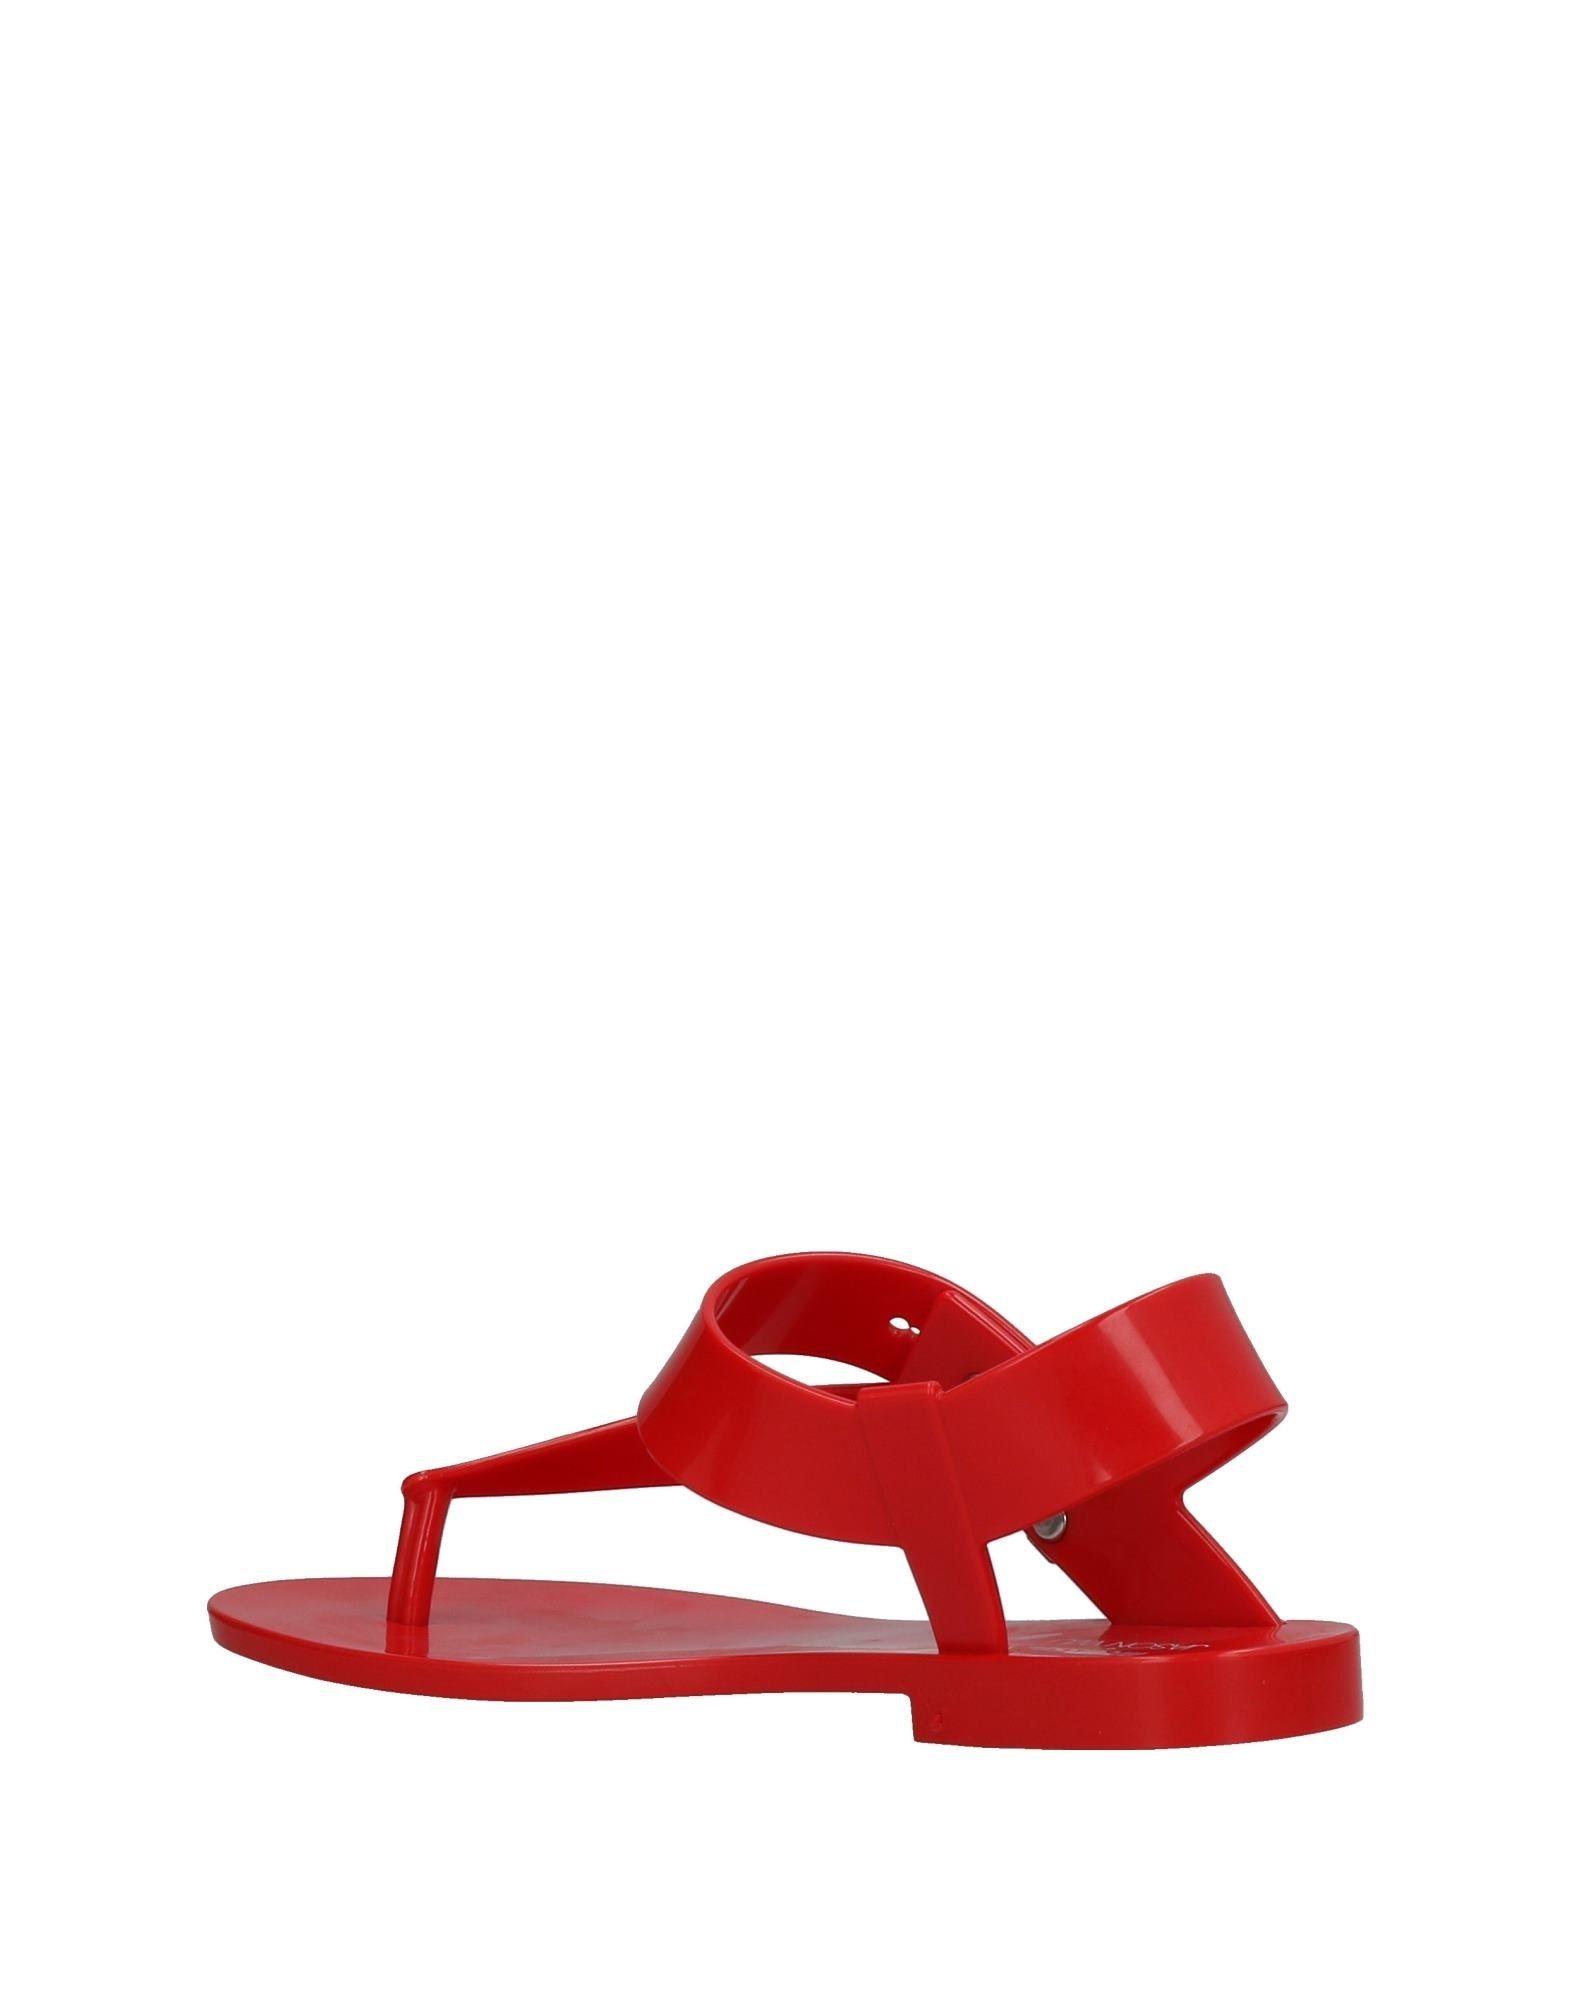 Melissa + Jason Wu Dianetten Damen  11195068FU Gute Qualität beliebte Schuhe